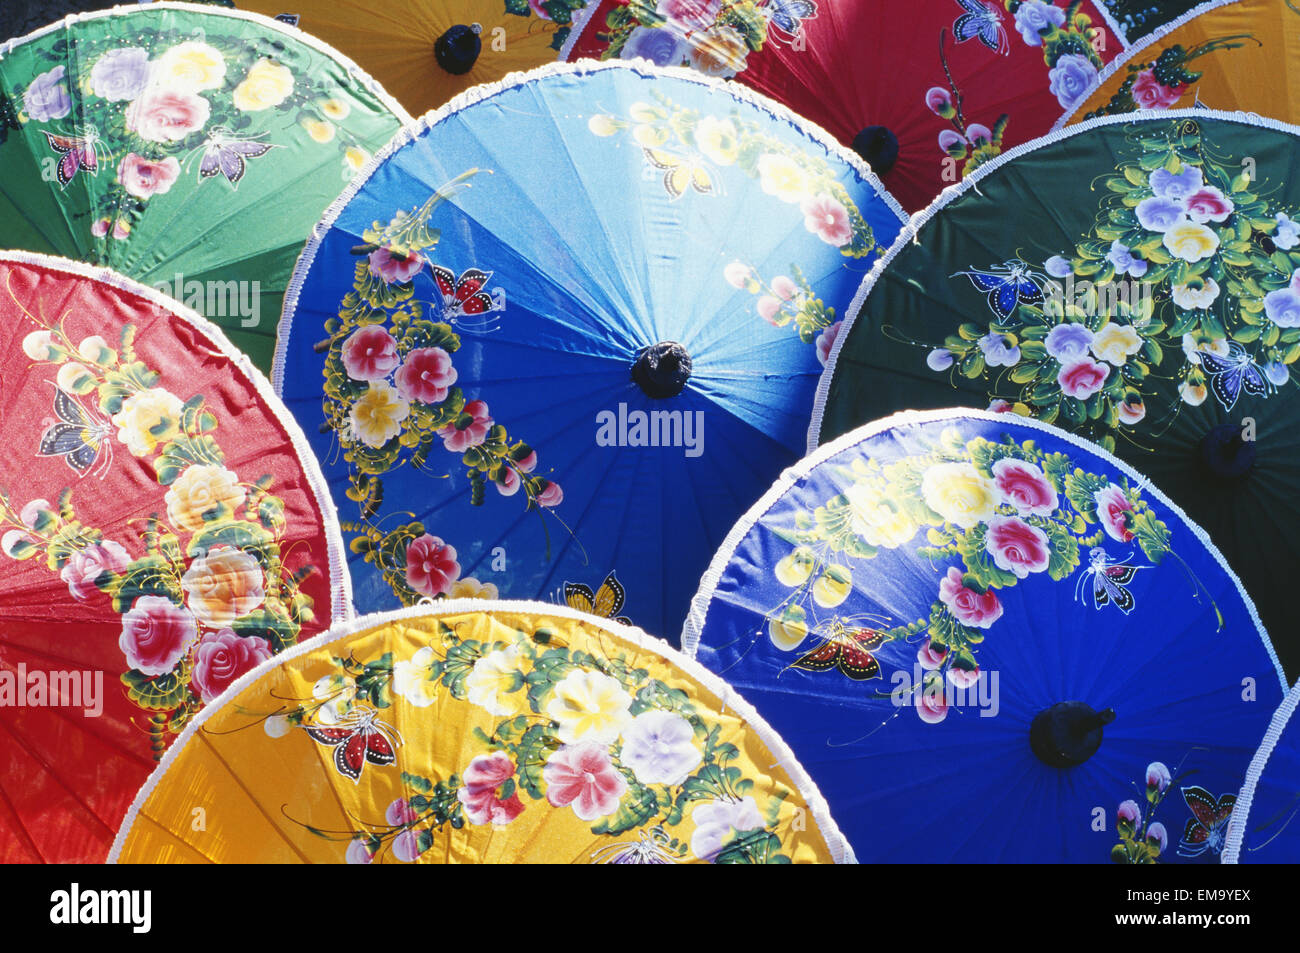 Thailand Ayutthaya Bang Sai Folk Arts And Crafts Village Hand Stock Photo Alamy